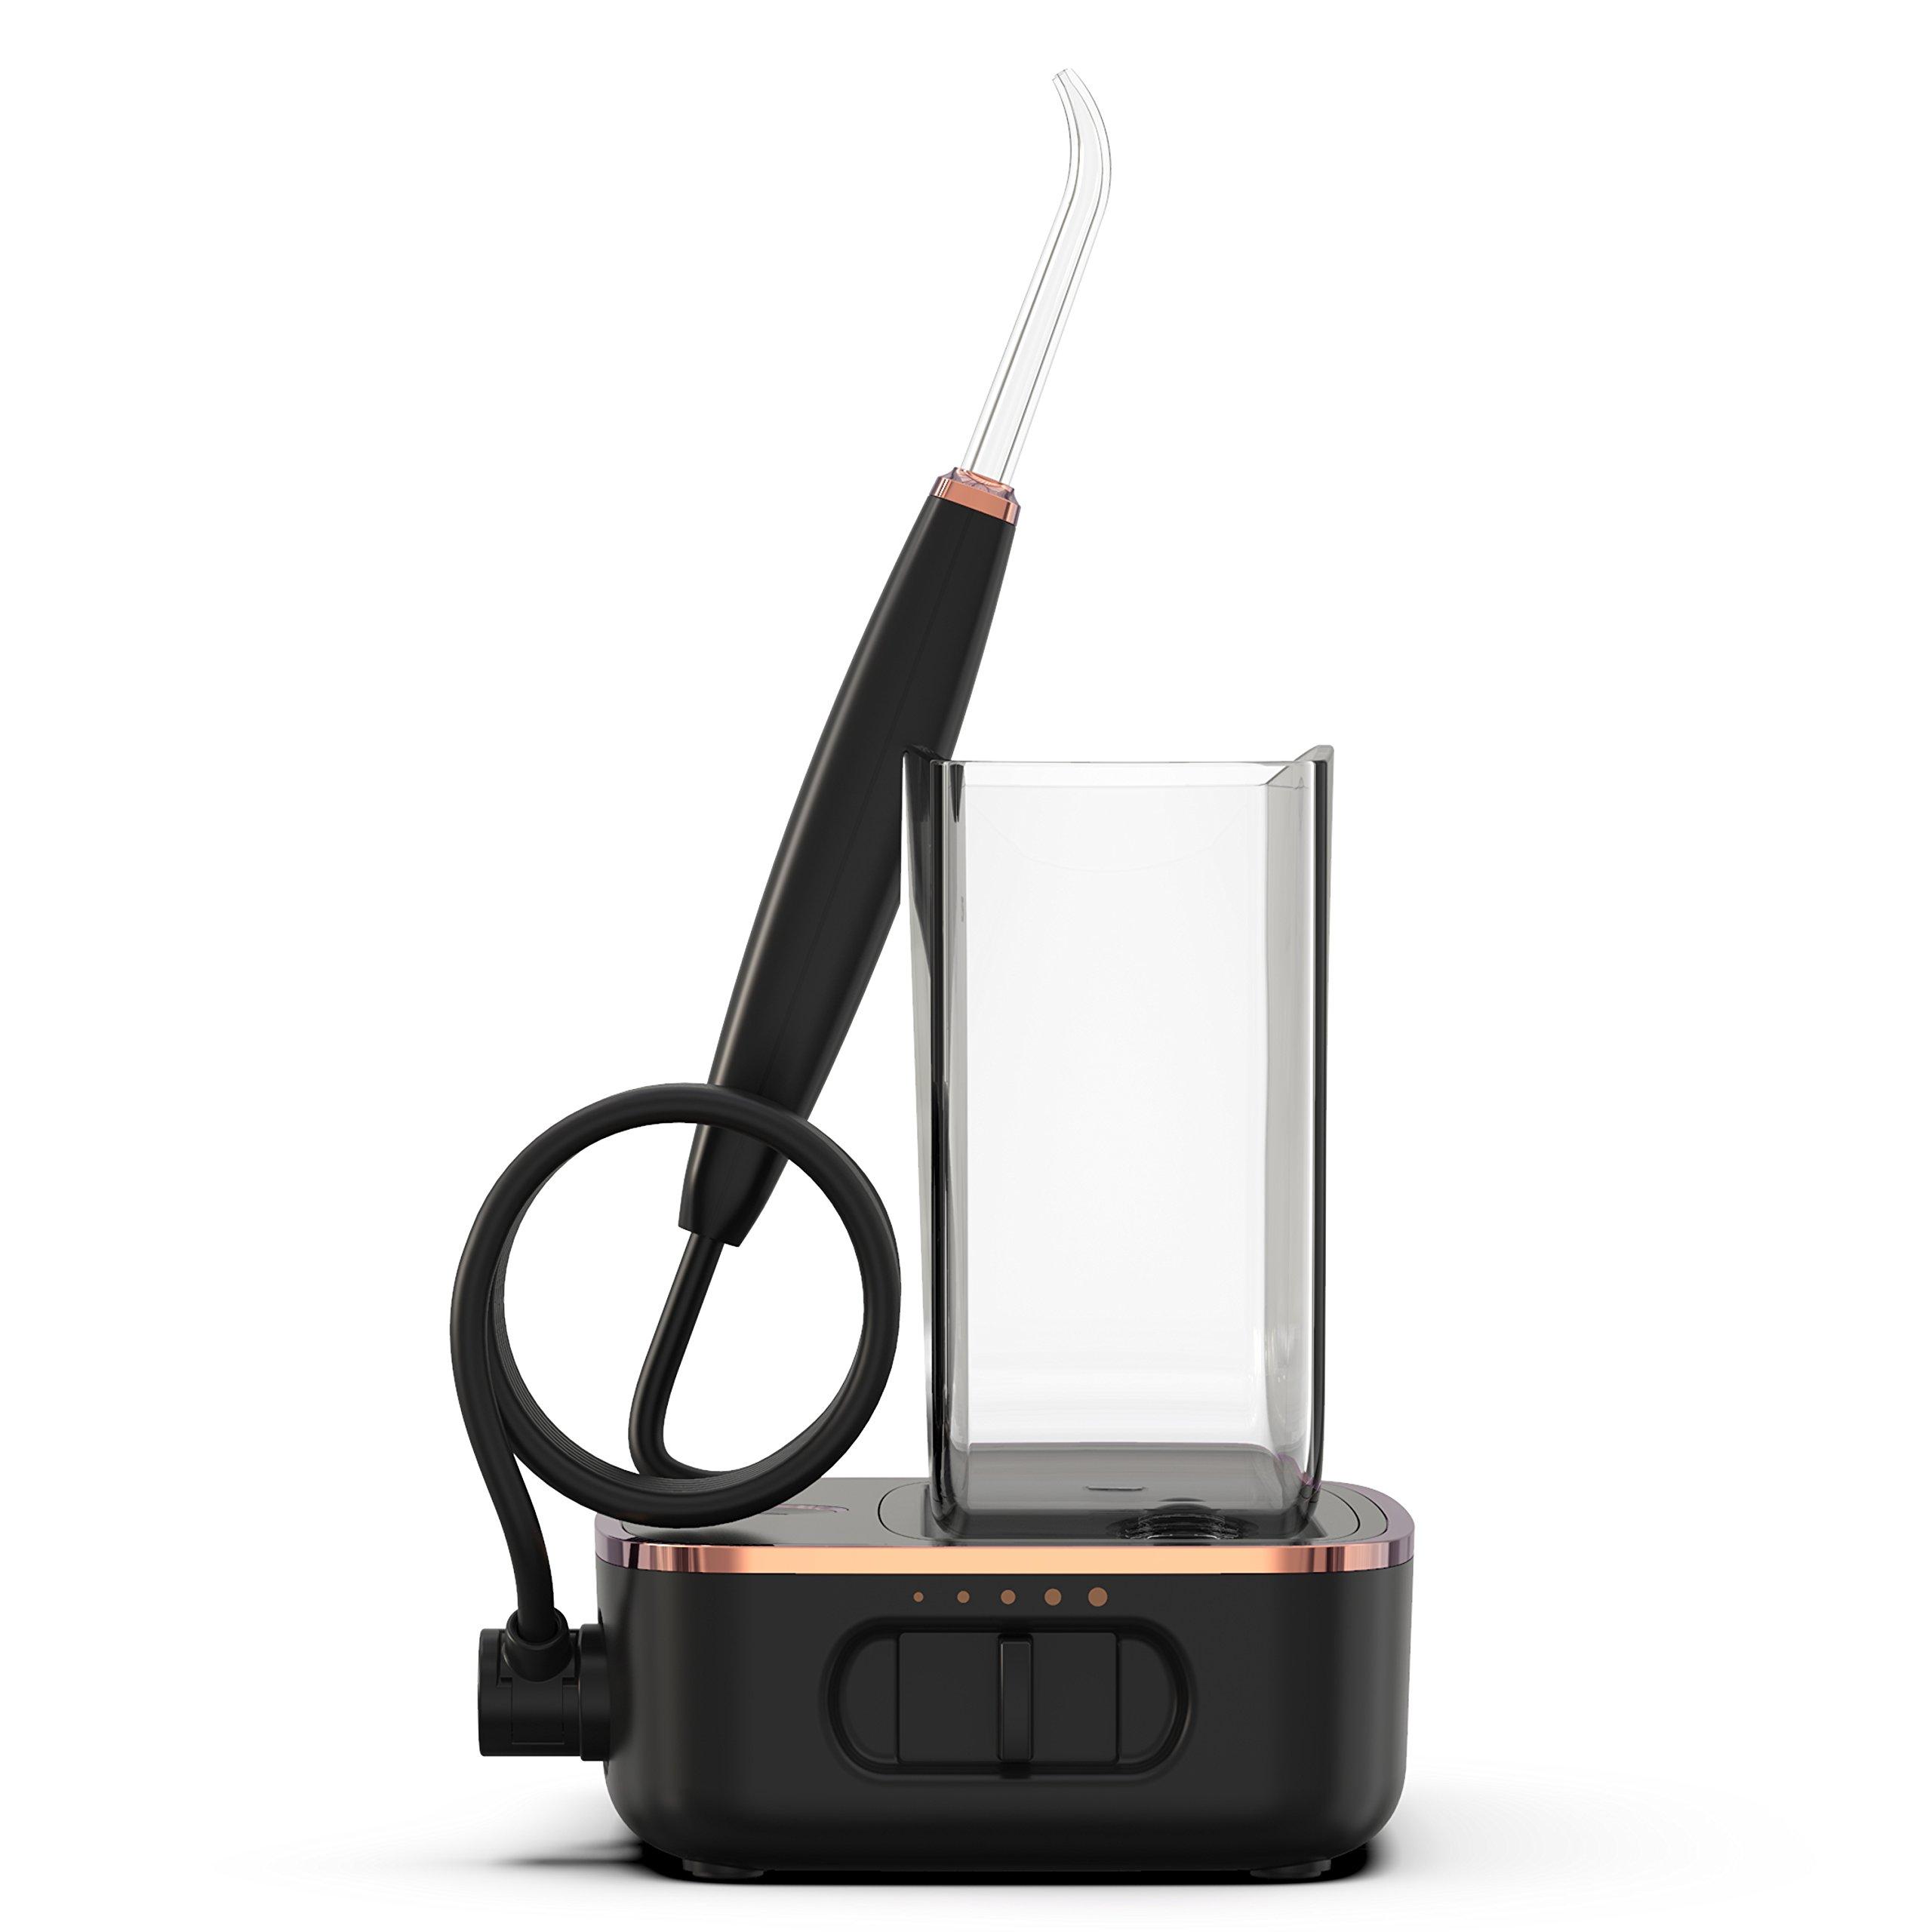 Waterpik Sidekick Water Flosser, Black/copper by Waterpik (Image #2)